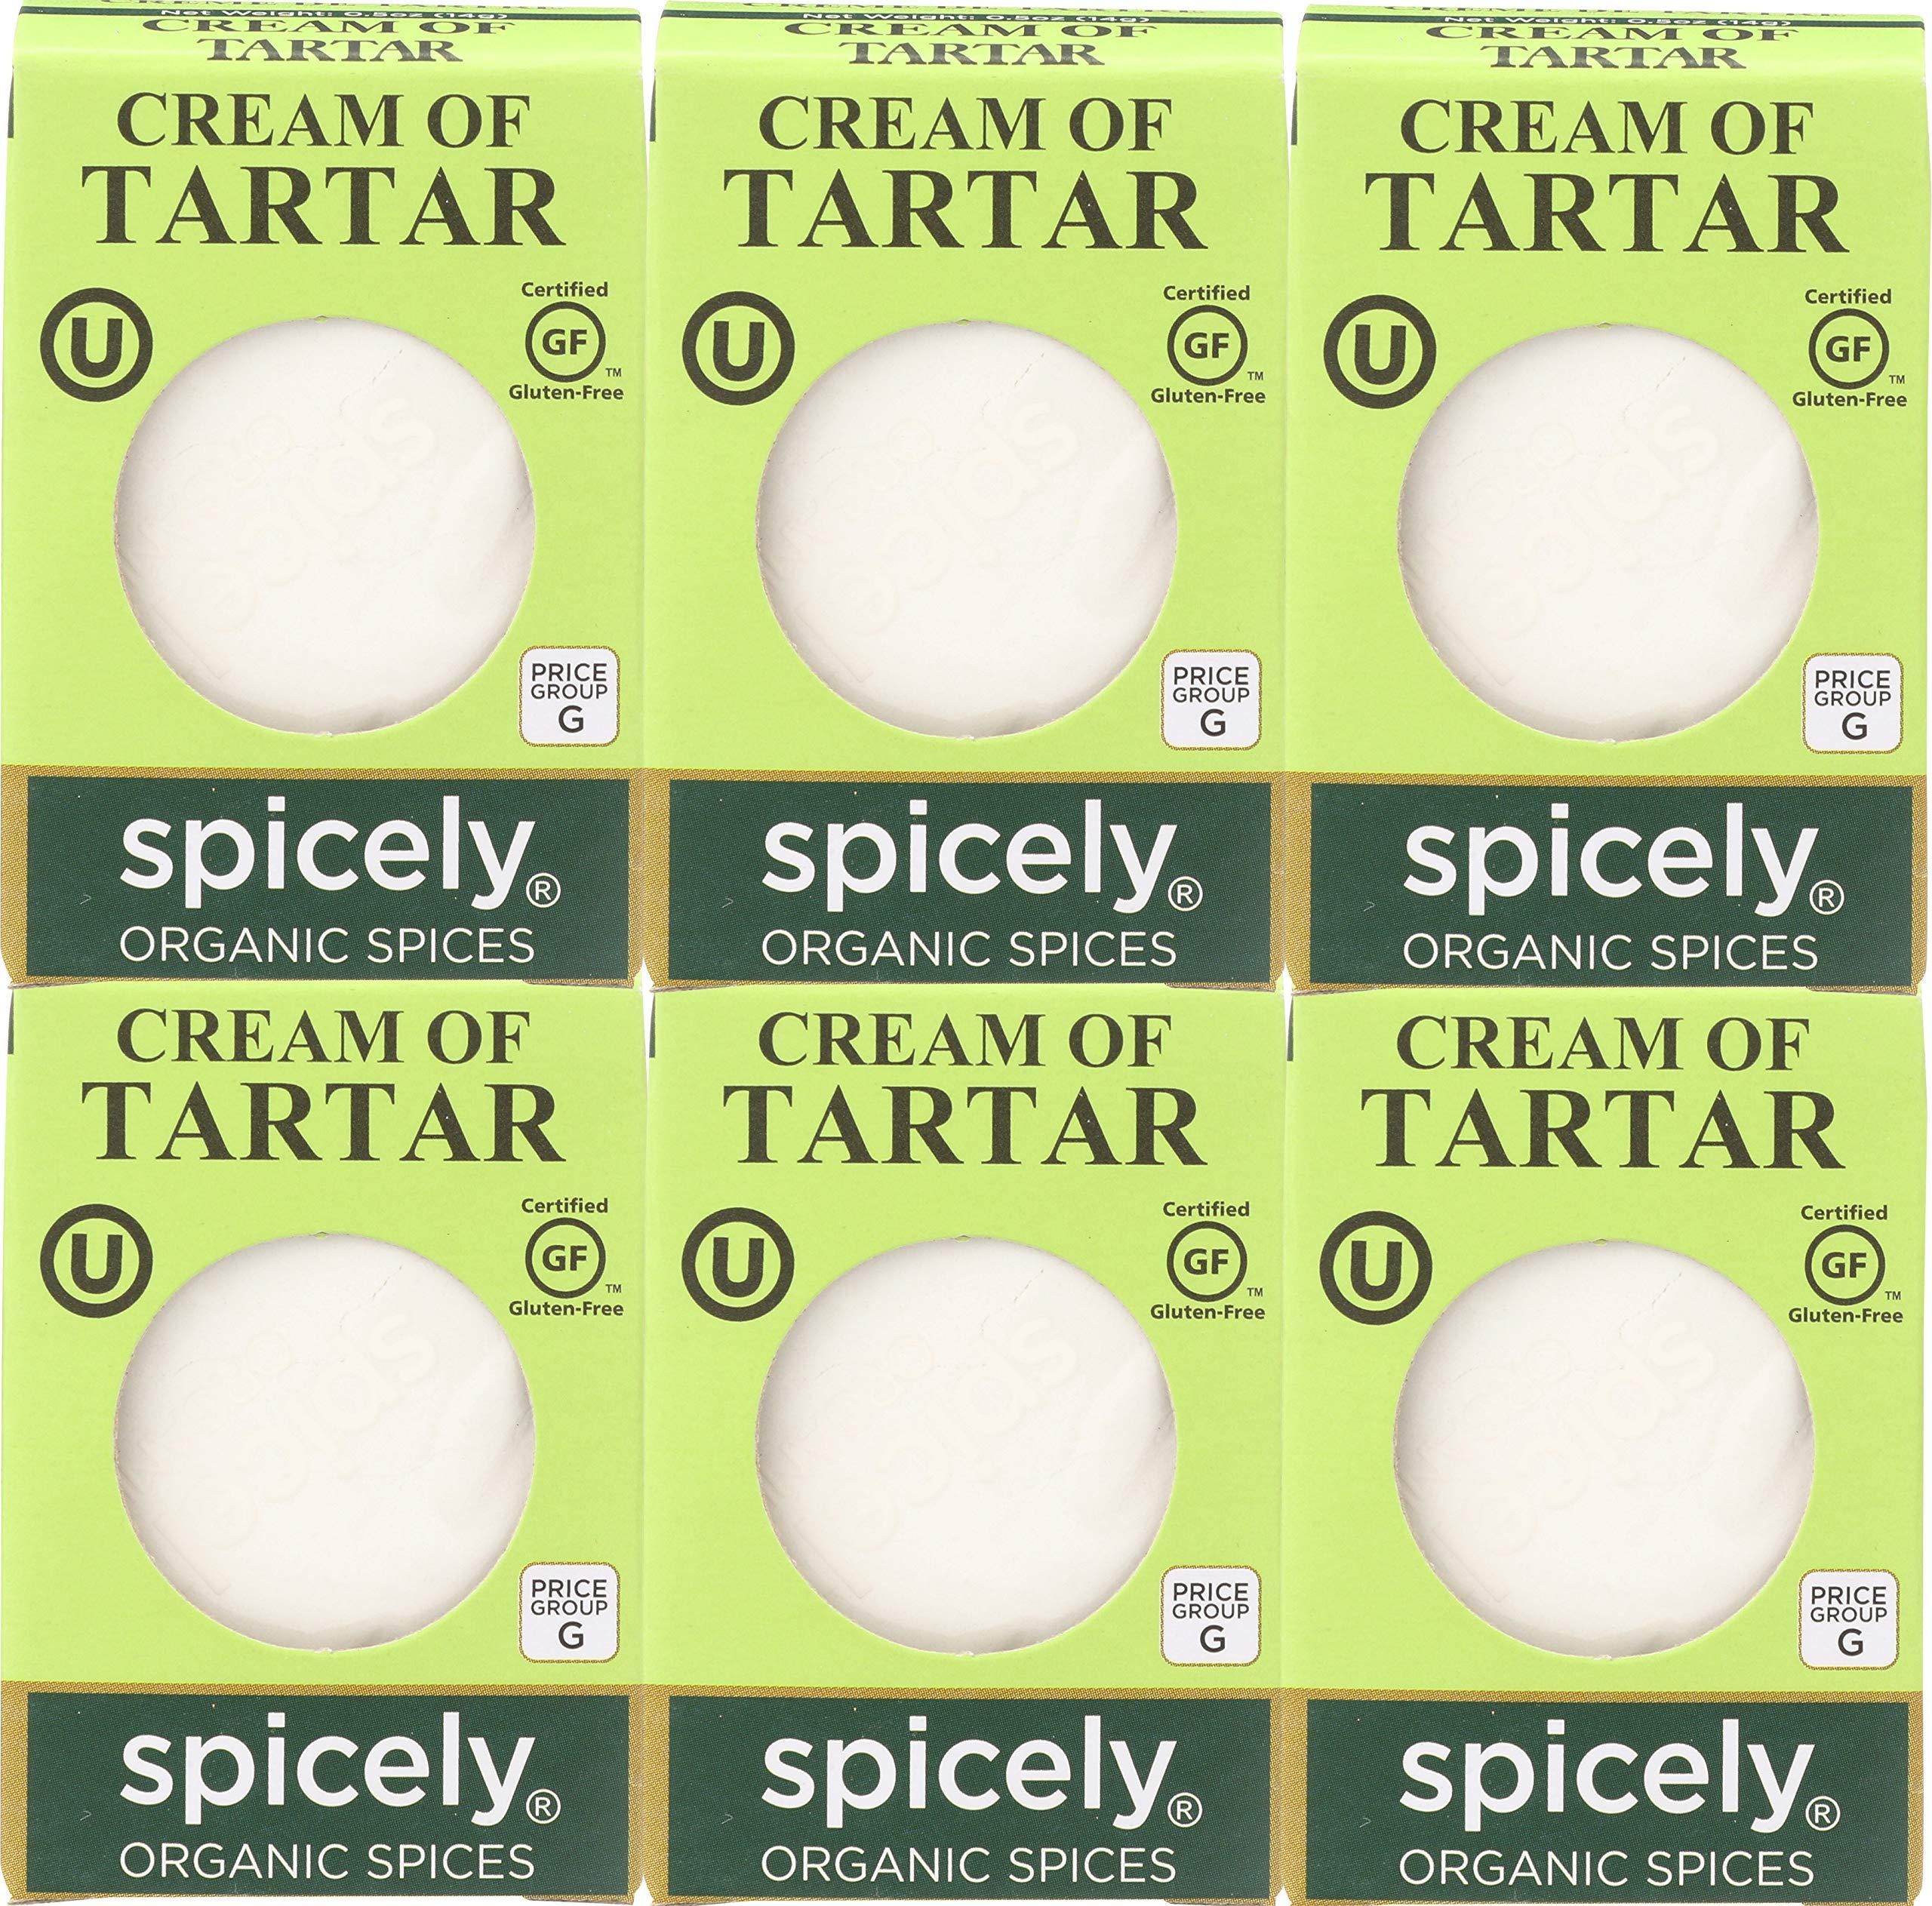 Spicely Cream Of Tartar 0.5 Oz (6 Pack) Certified Gluten Free